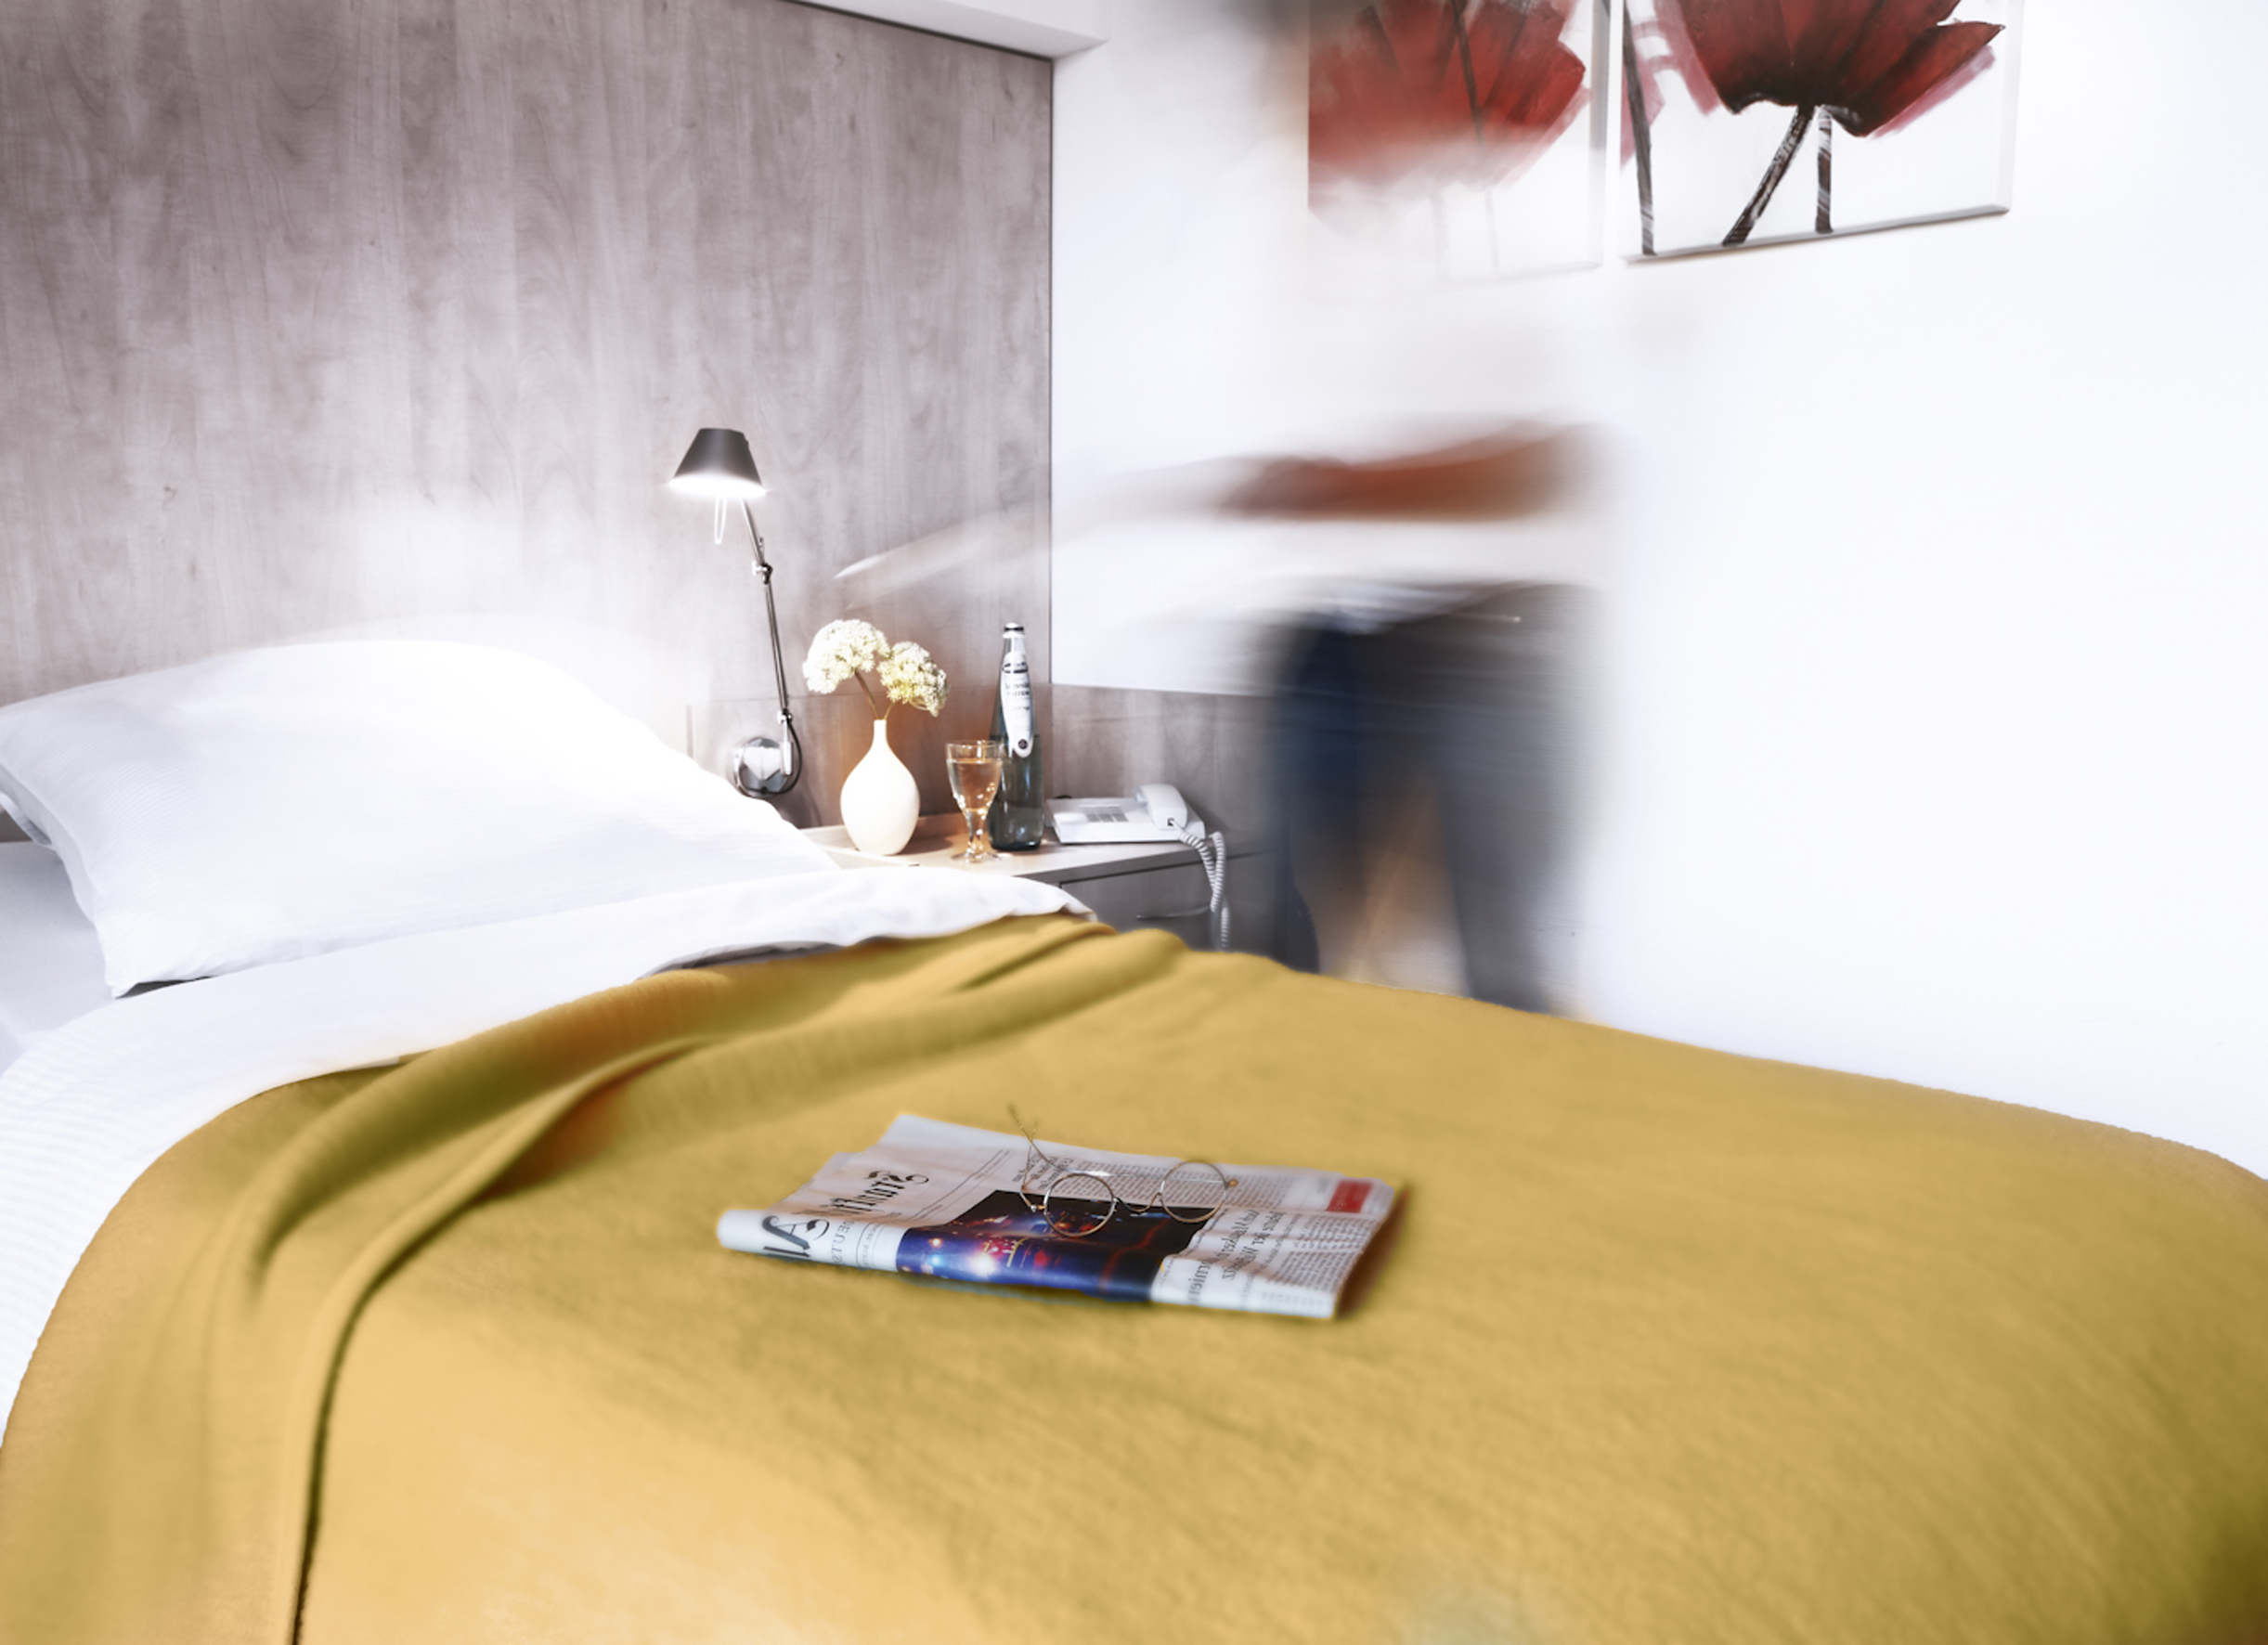 Marlikon Shop Webdecke Zusatzdecke Schwer Entflammbar Decke